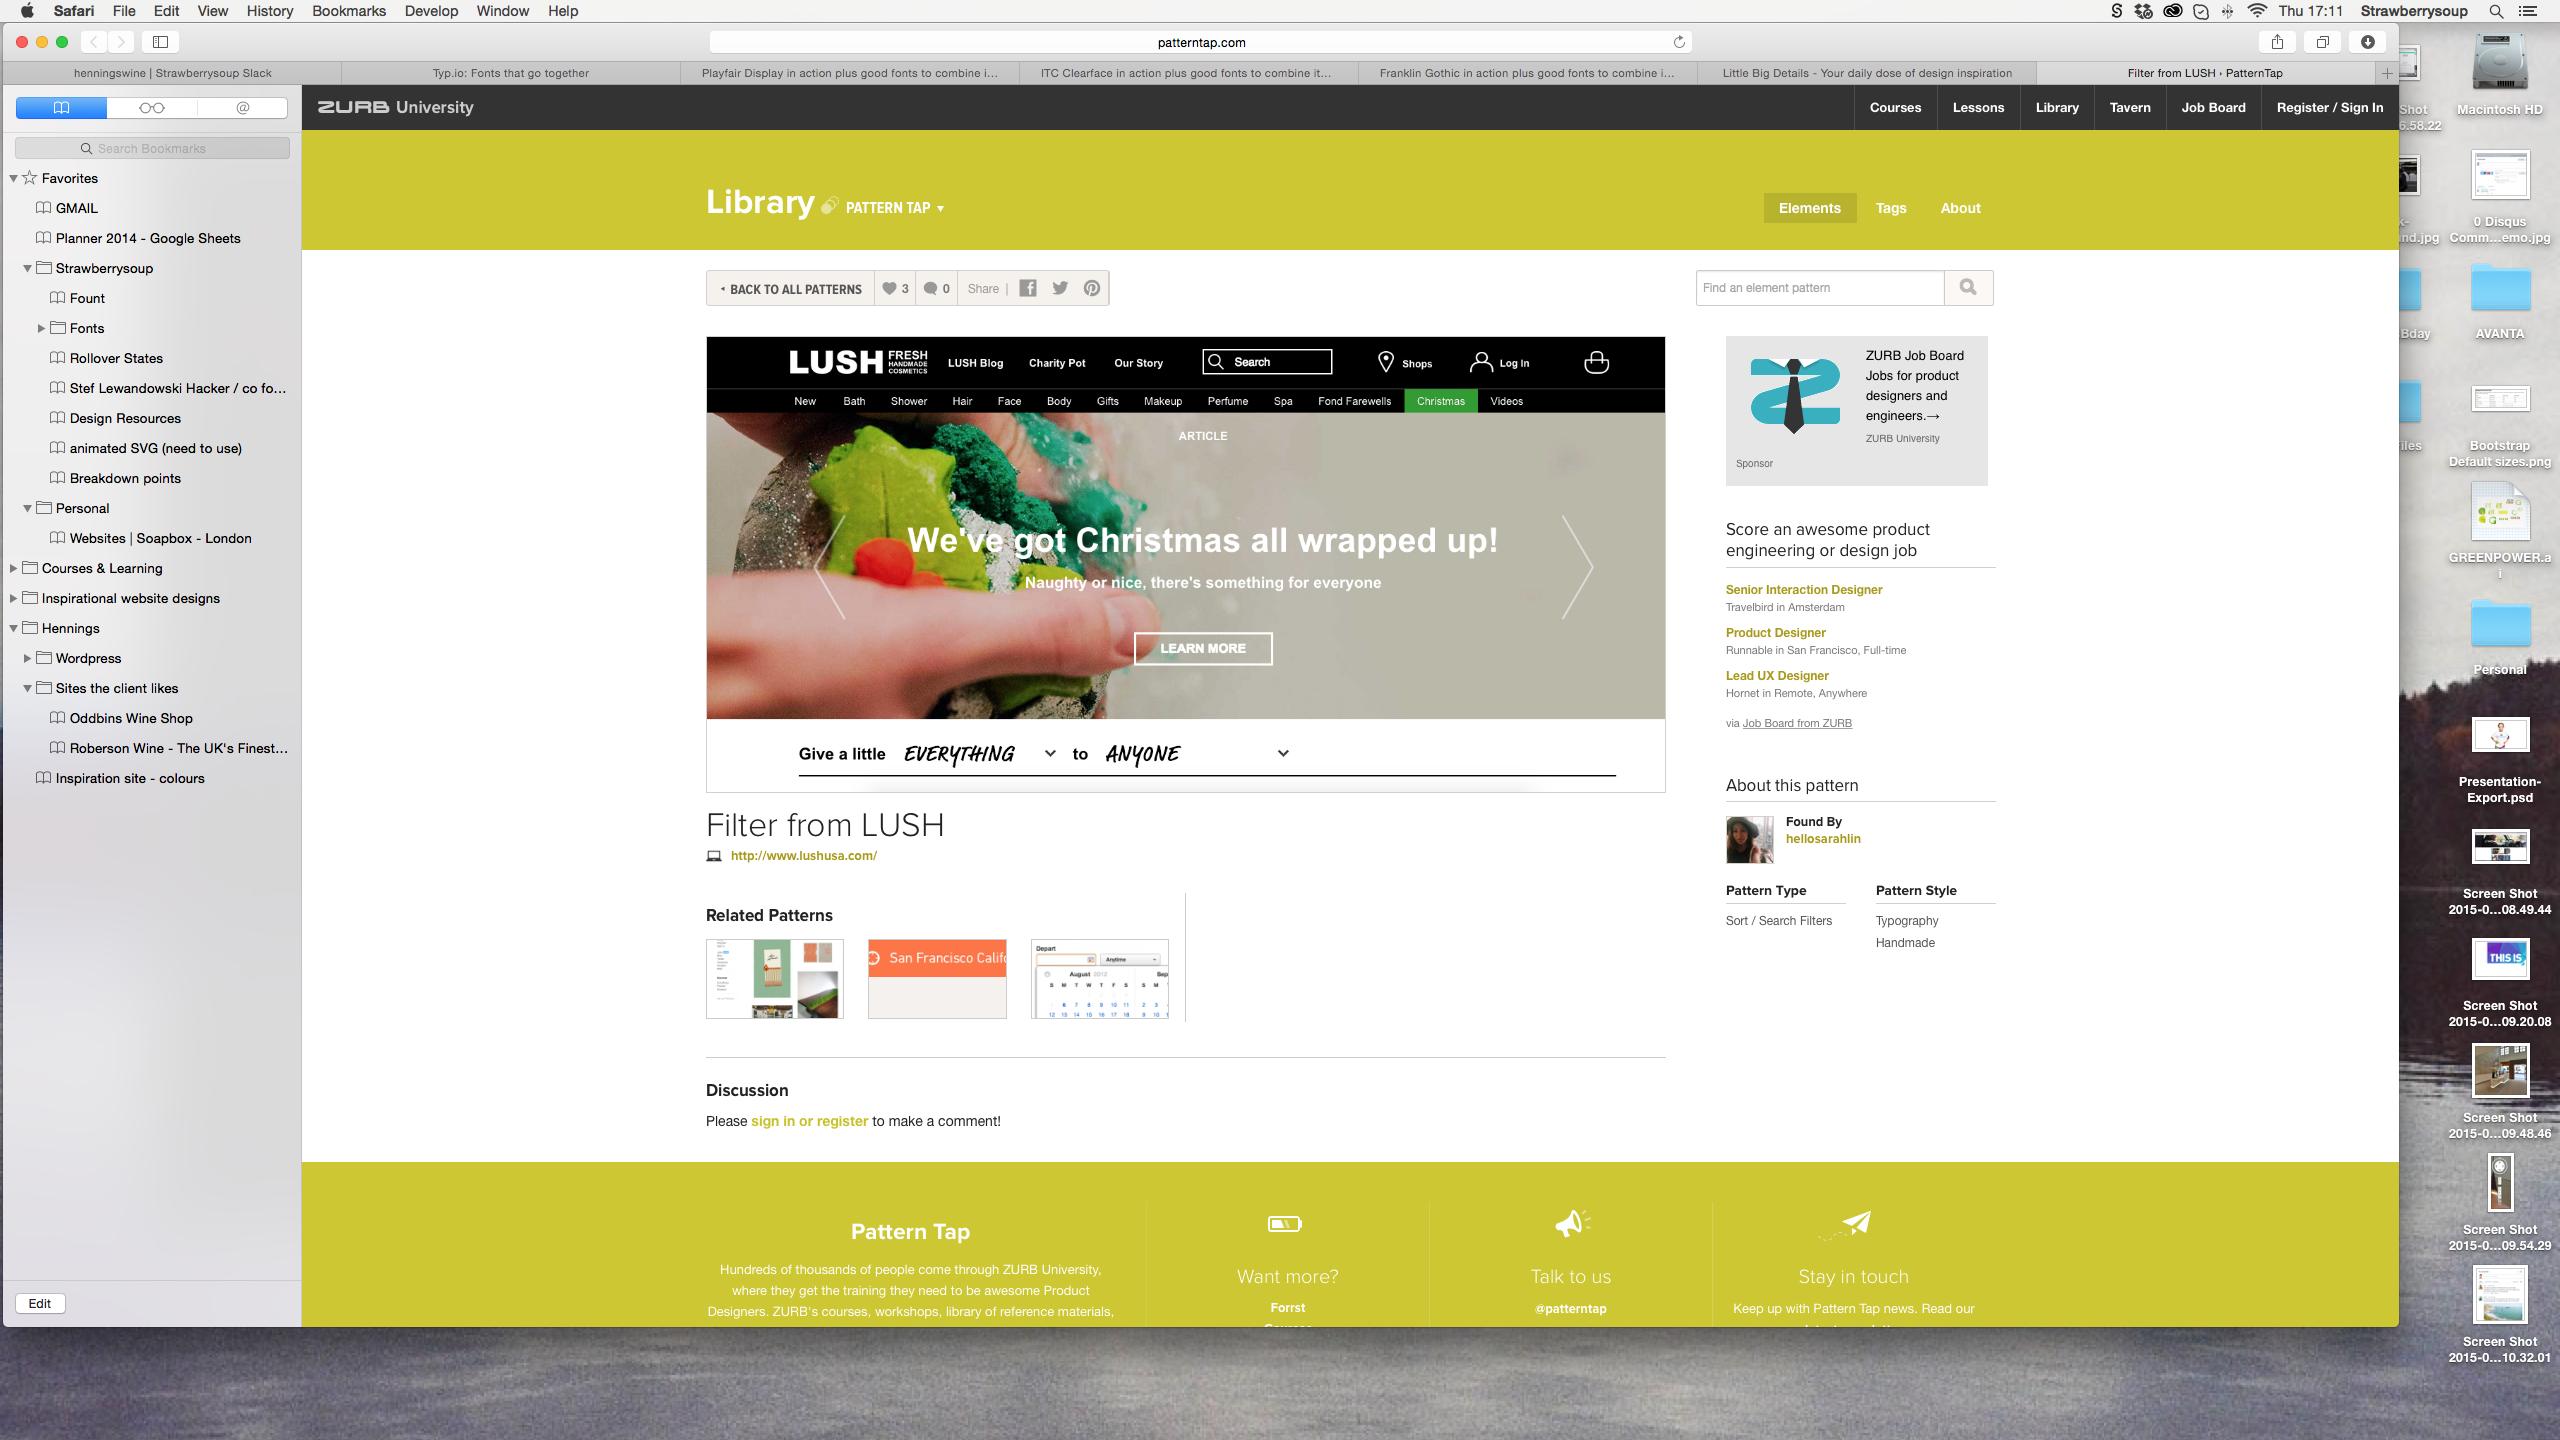 Colour Frame | Web design I like | Pinterest | Frames and Colour